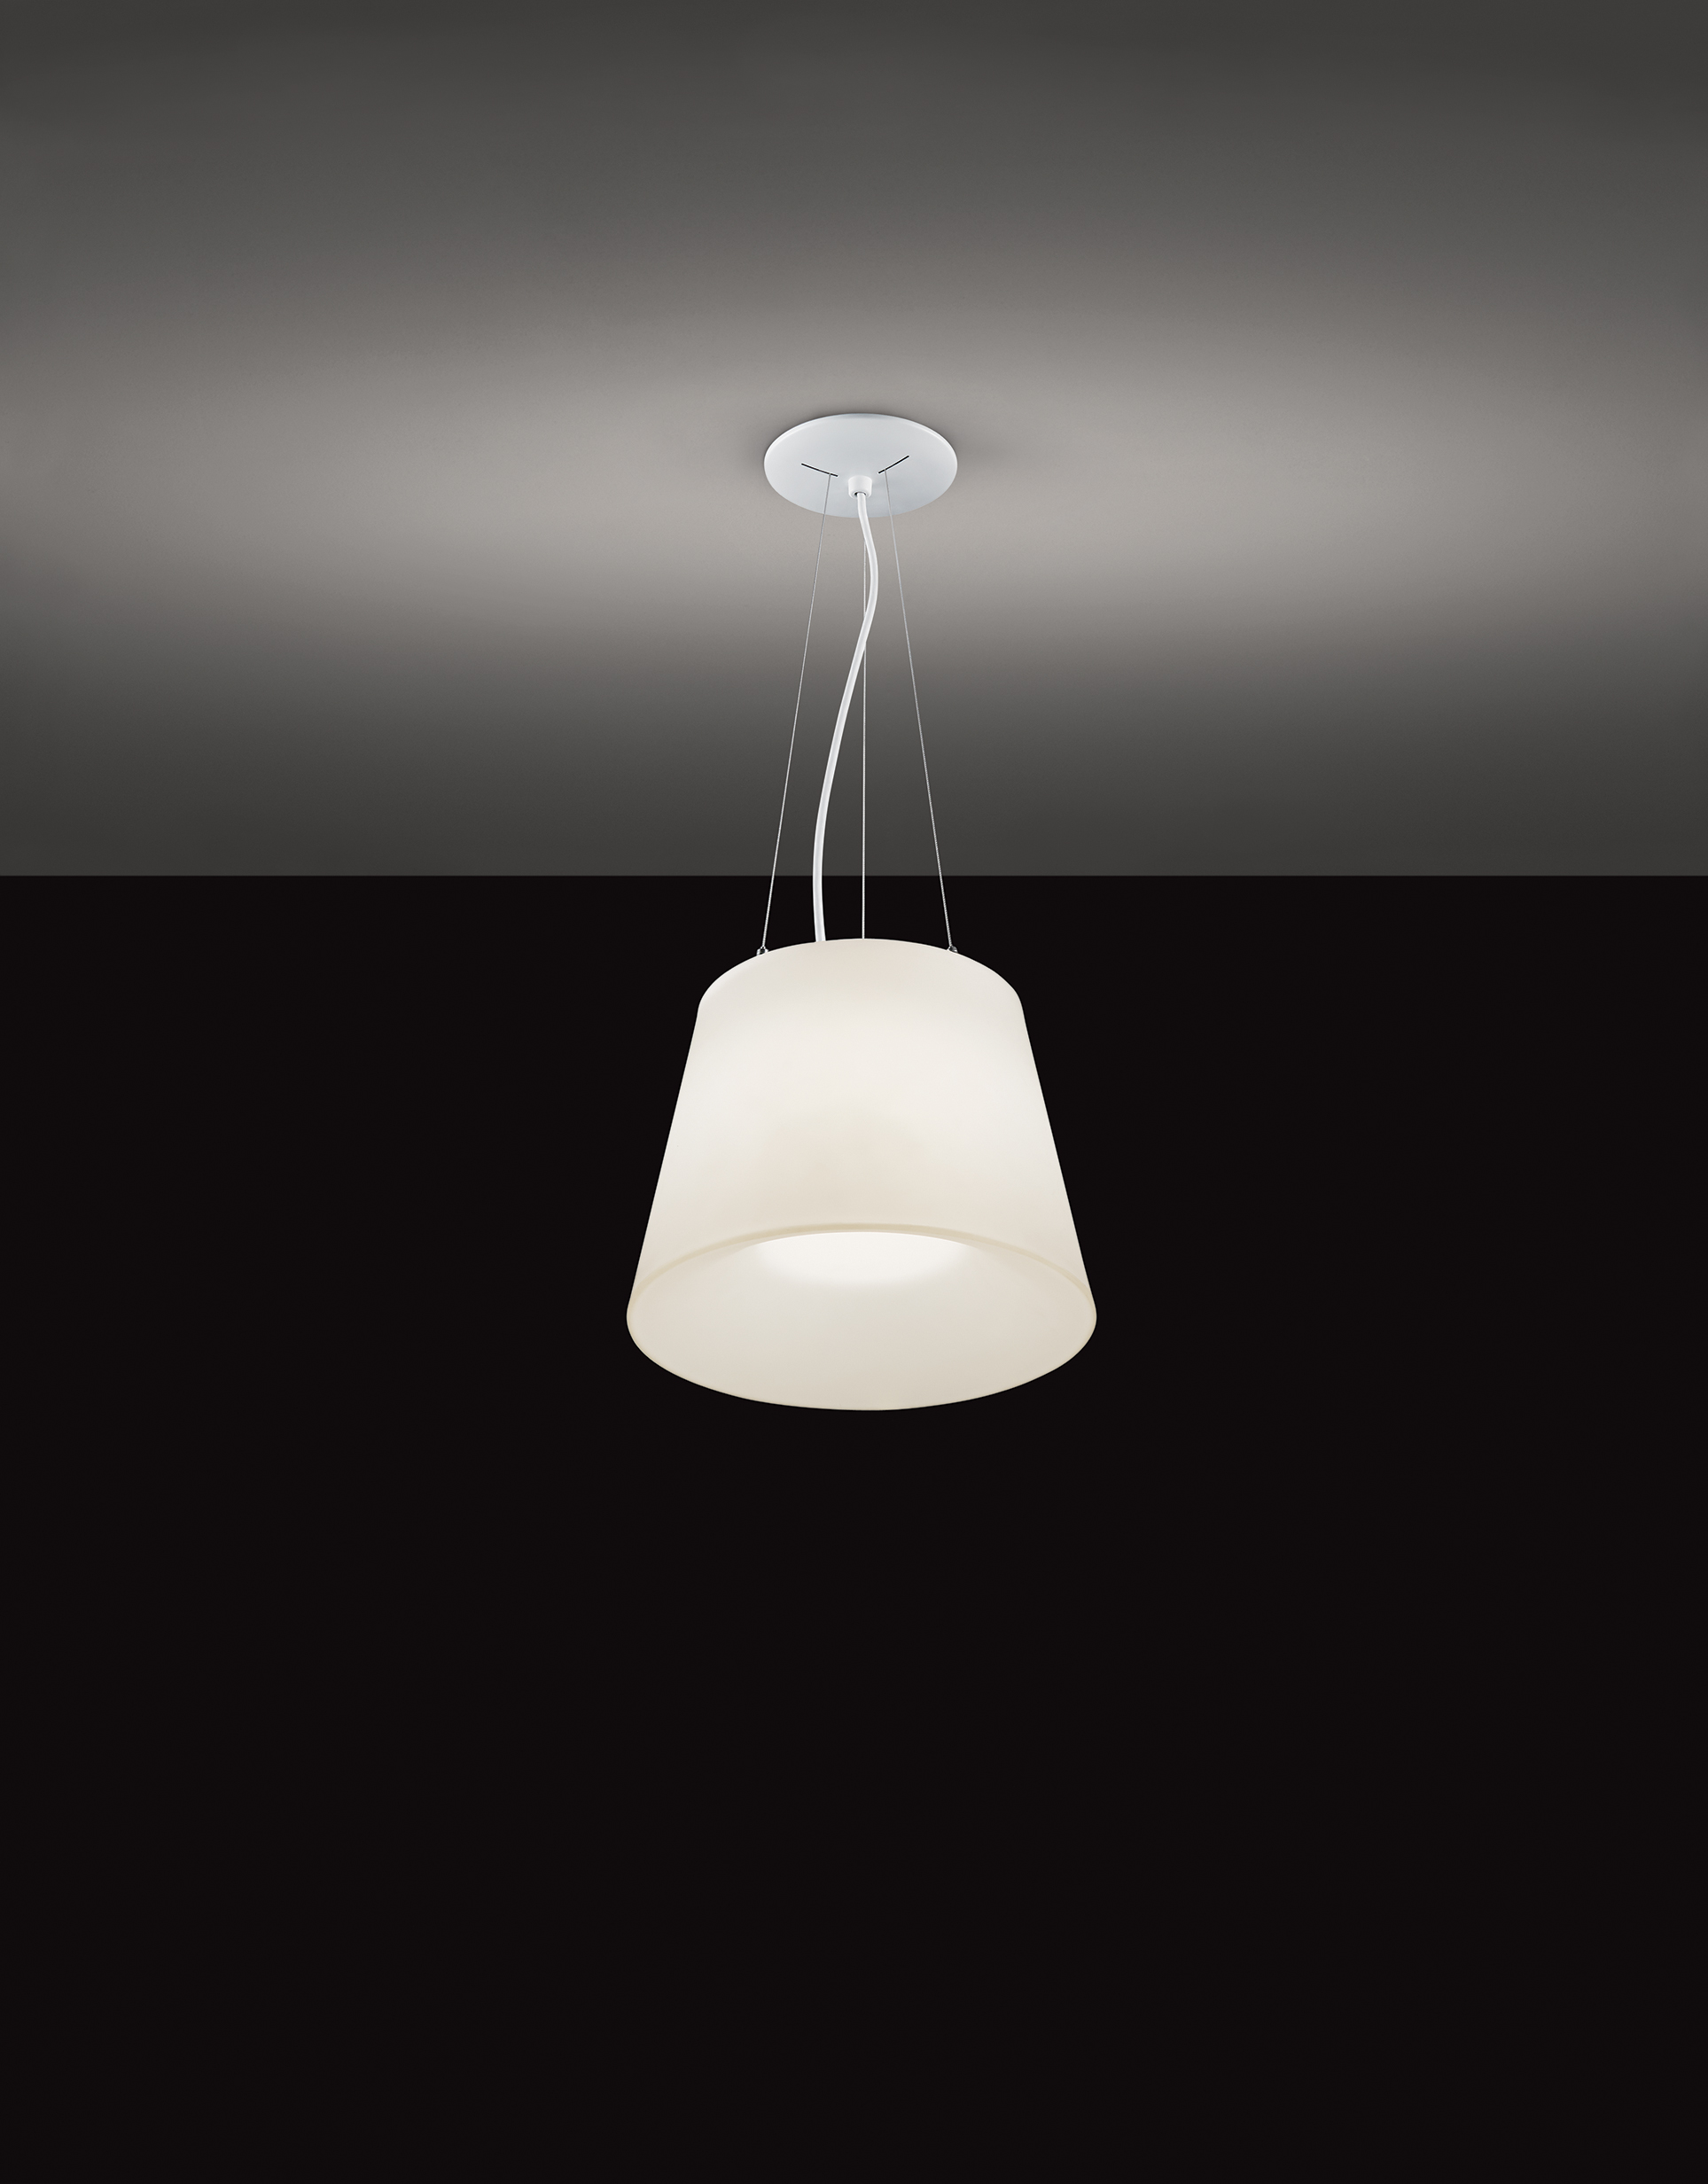 Loop™ Pendant - OCL Architectural Lighting